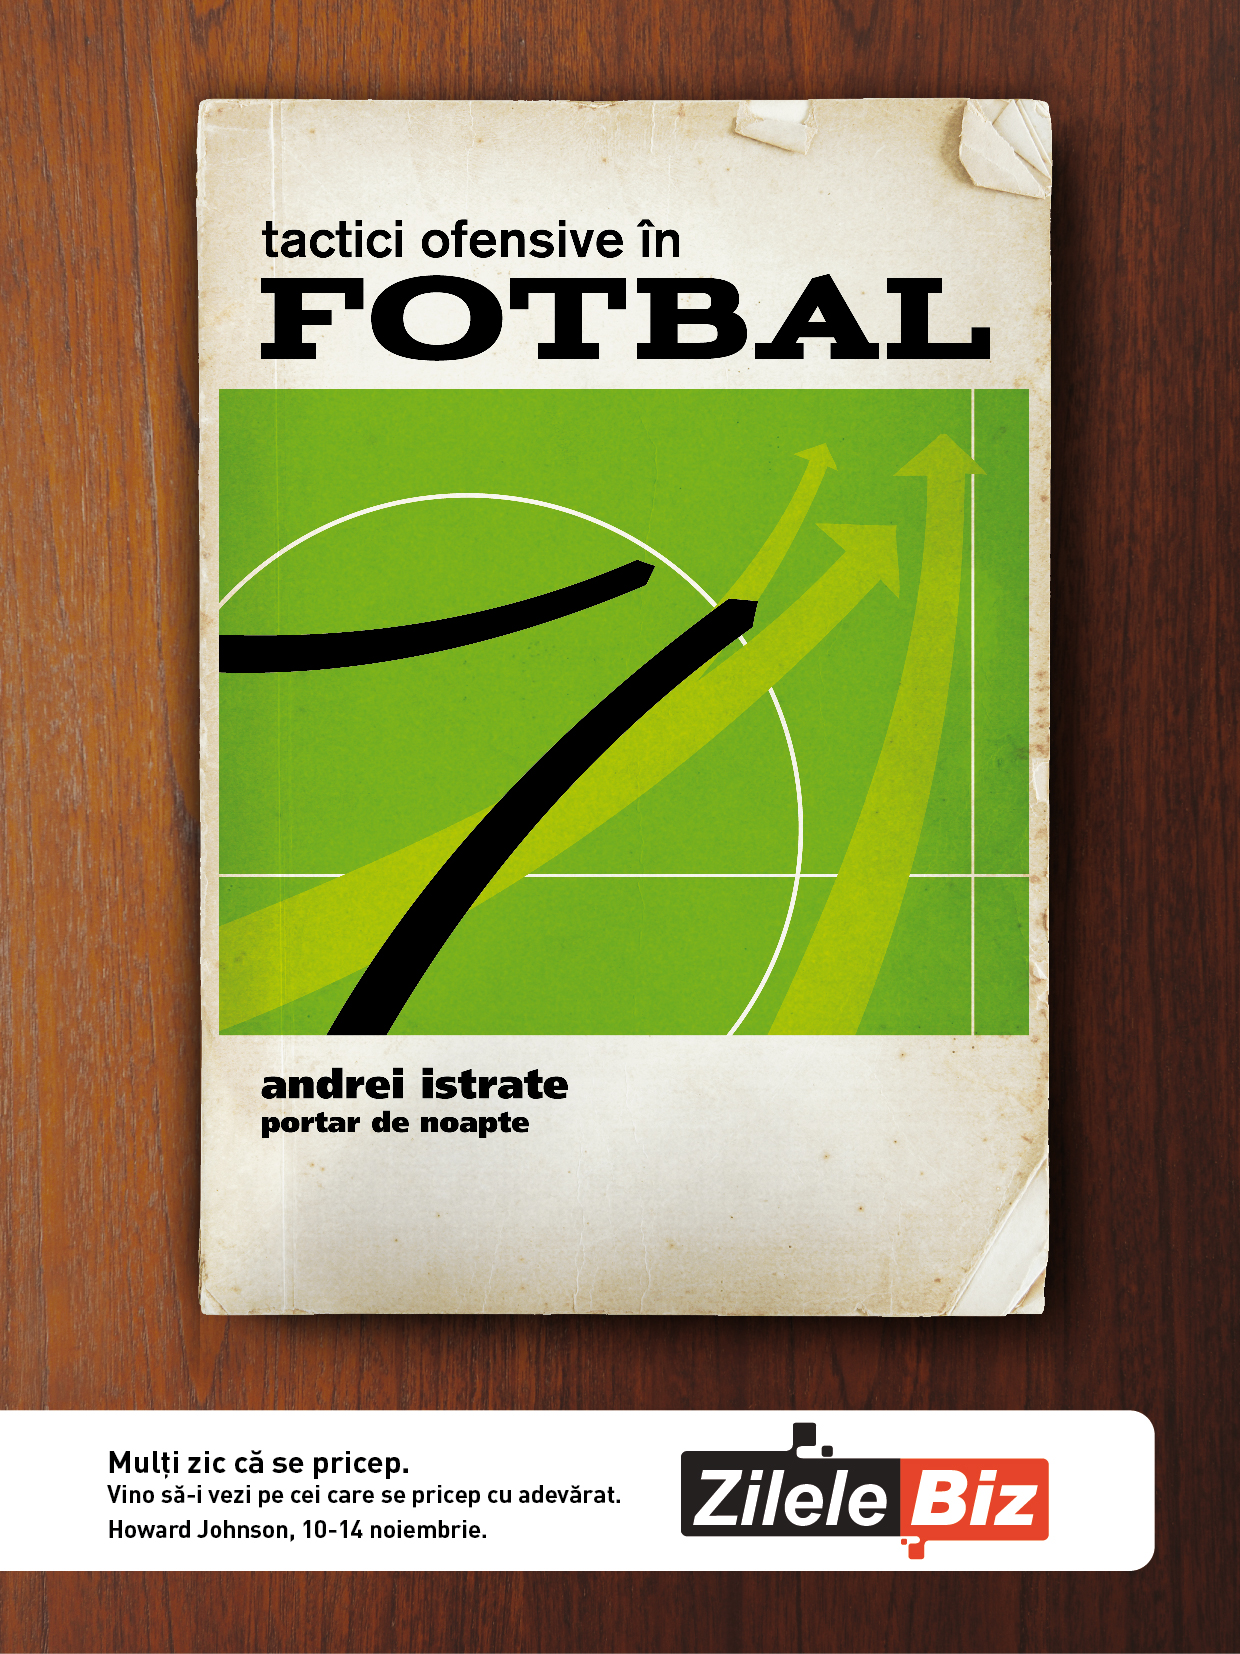 BIZZ_Zilele BIZZ_Fotbal-01